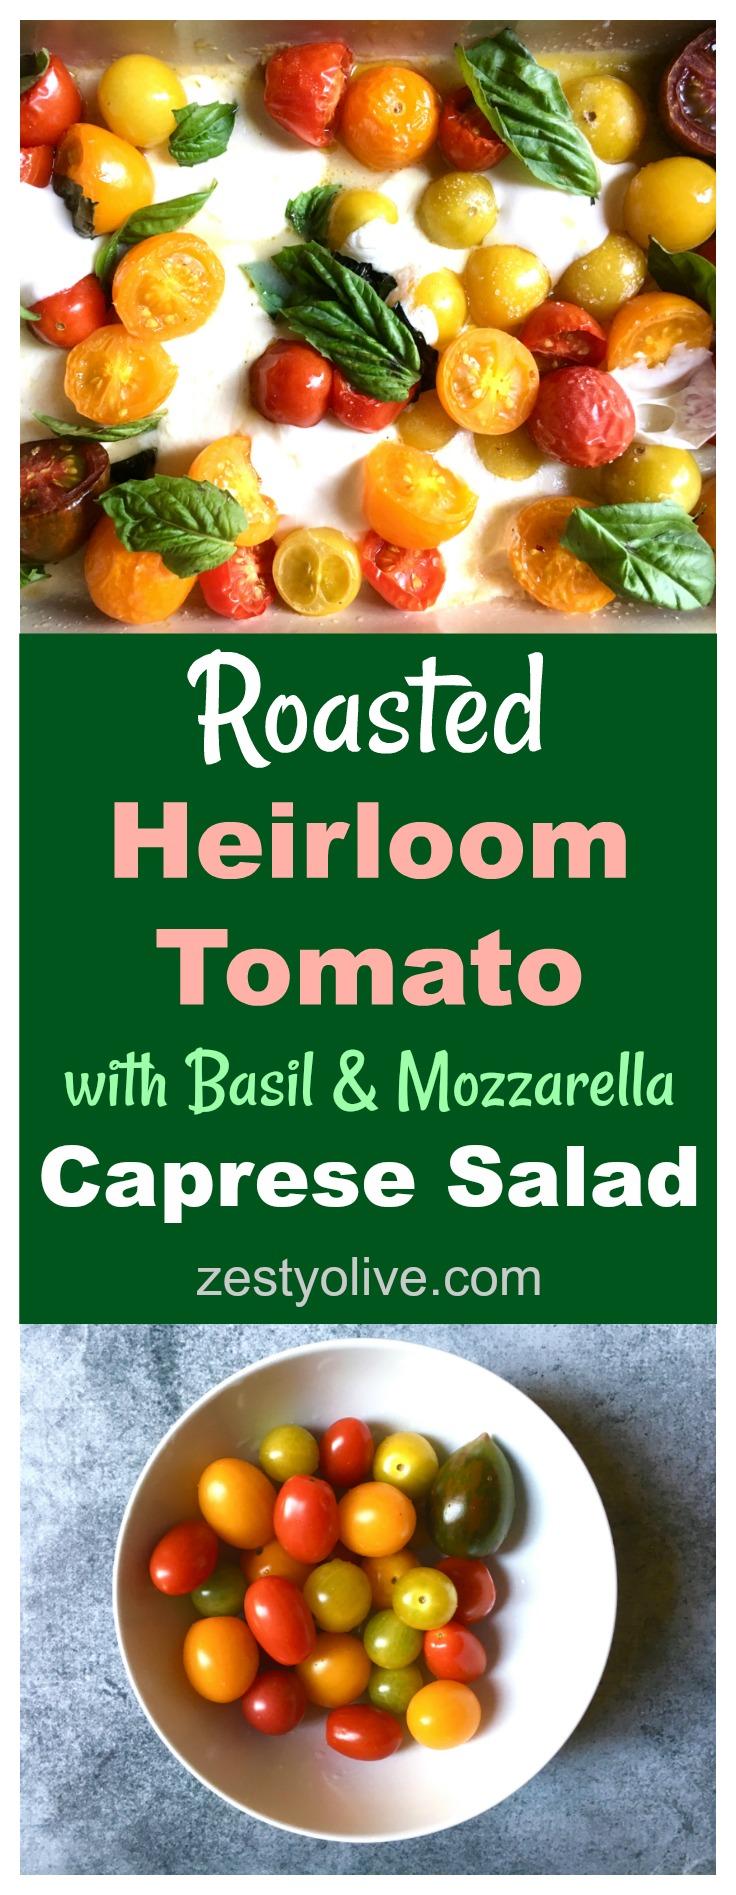 Roasted-Tomato-Basil-Mozzarella-Caprese-Salad